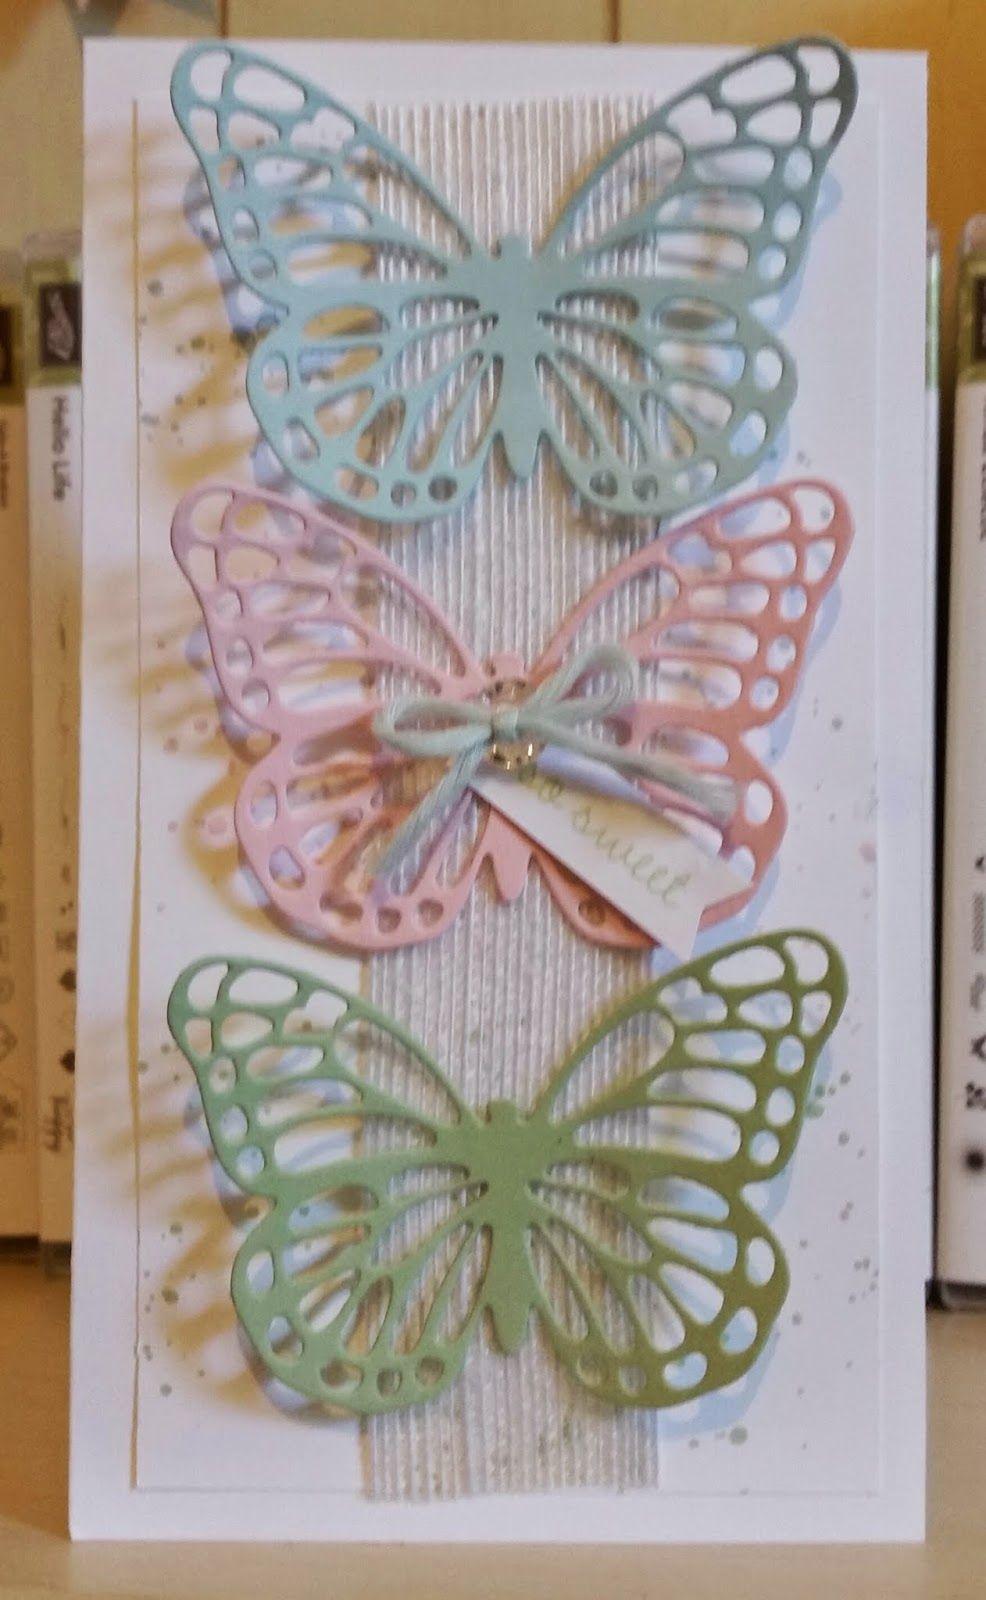 Windy's Wonderful Creations: PPA243 Soft So Sweet!